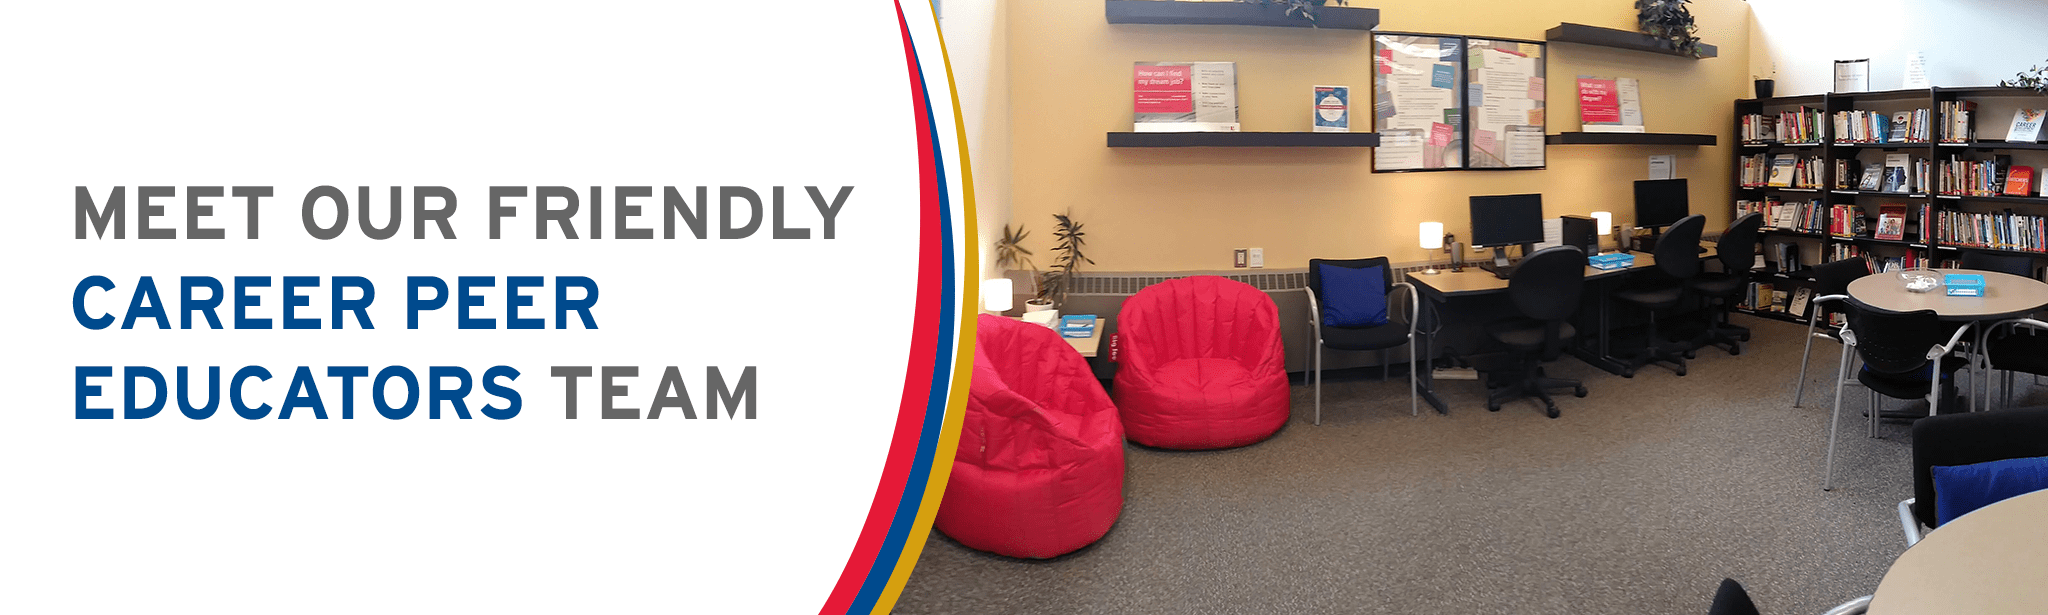 Meet the Career Peer Educators at the Career Lounge